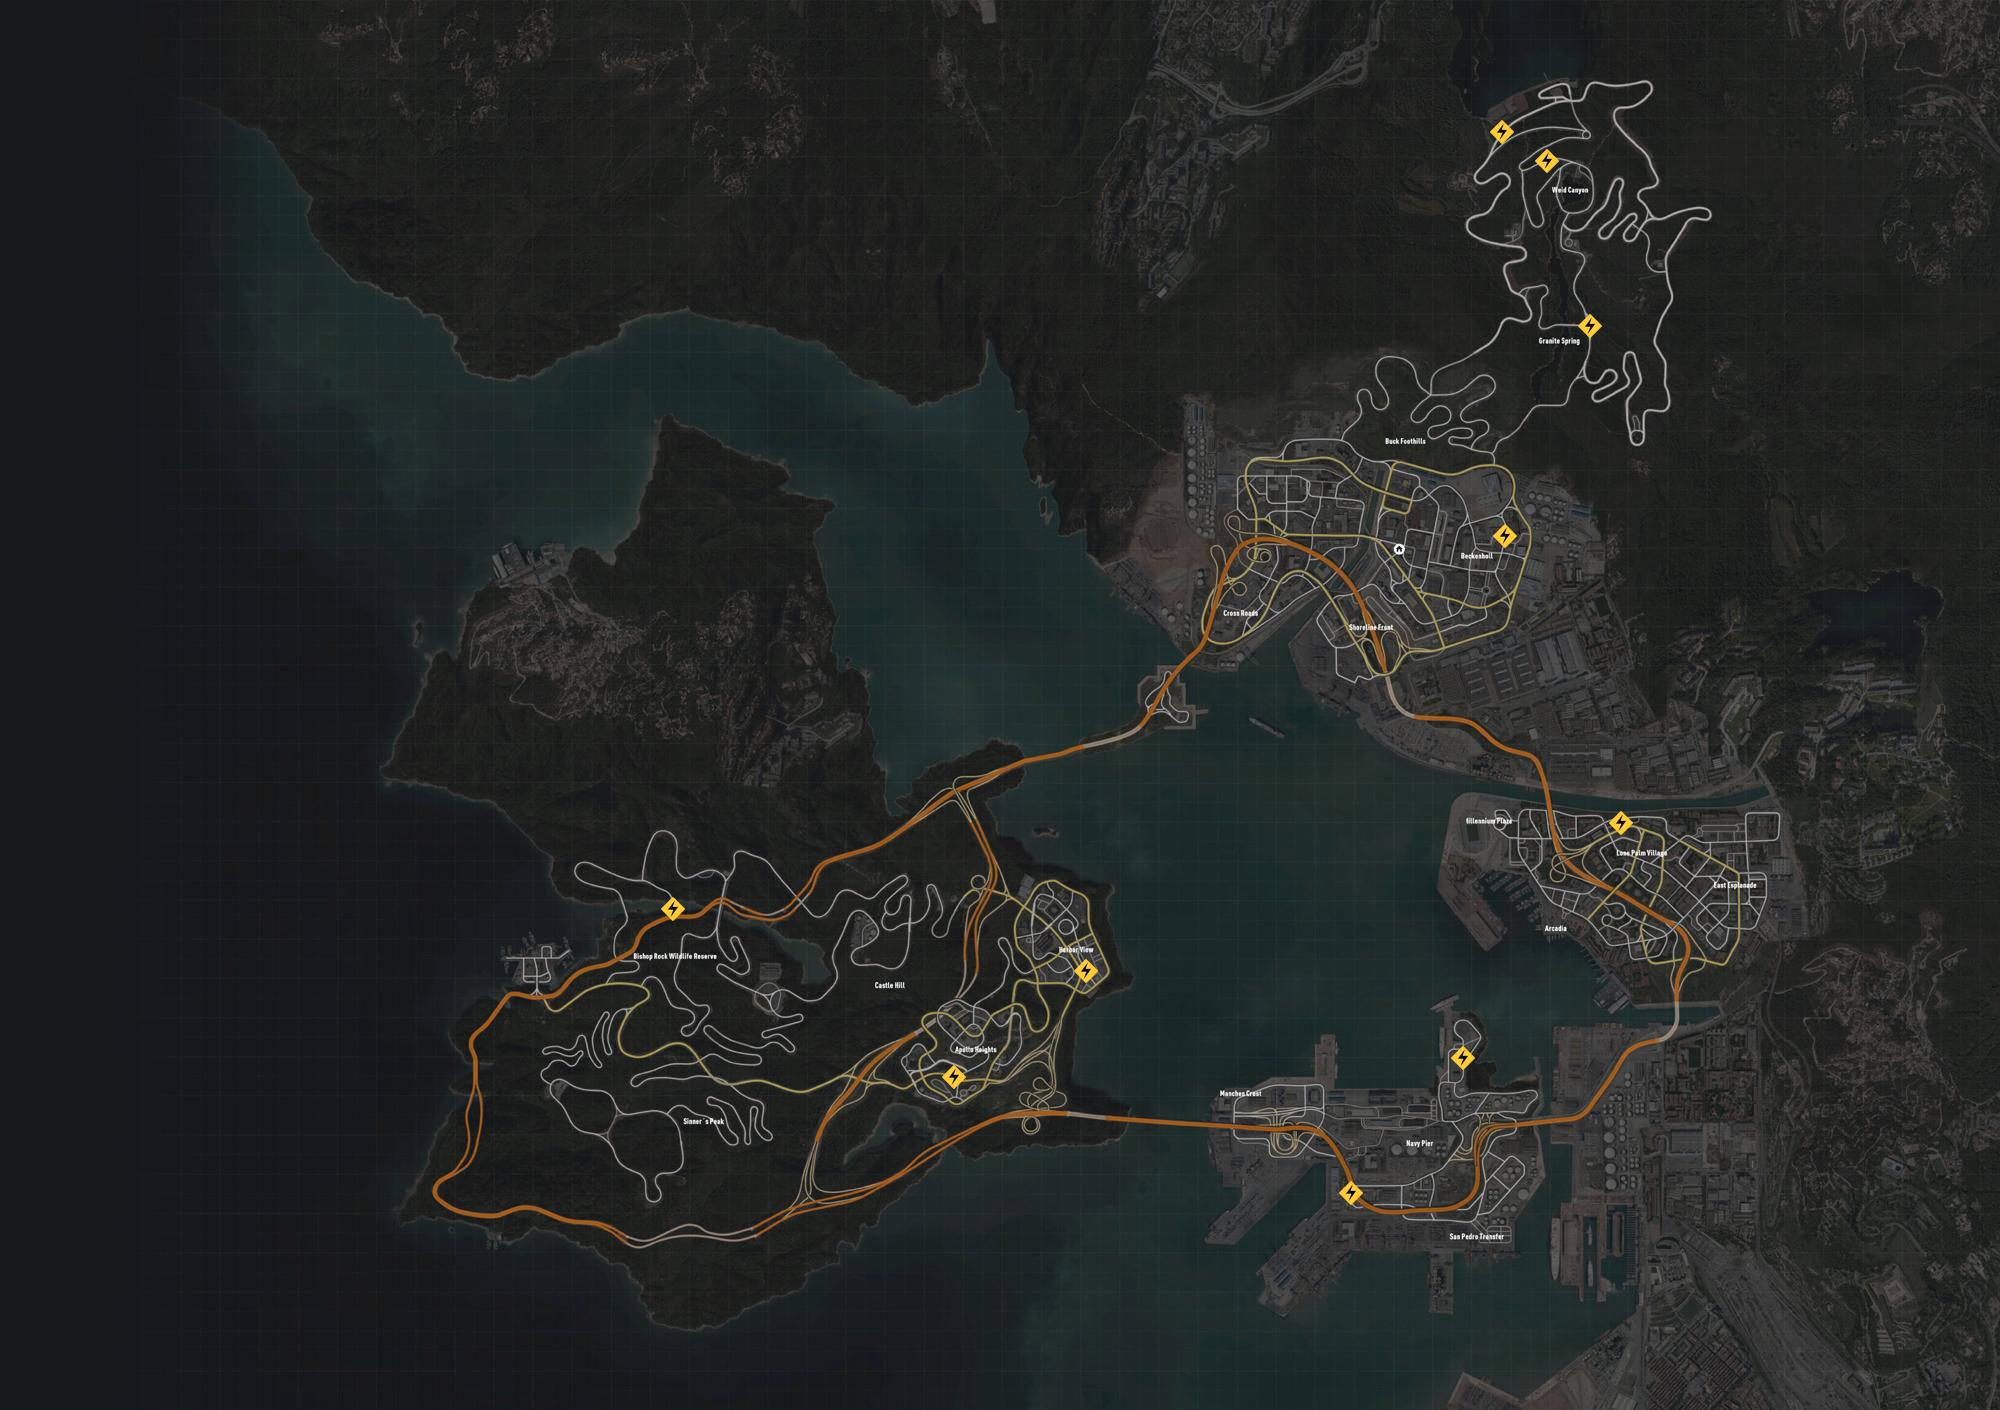 Nfs Undercover Map